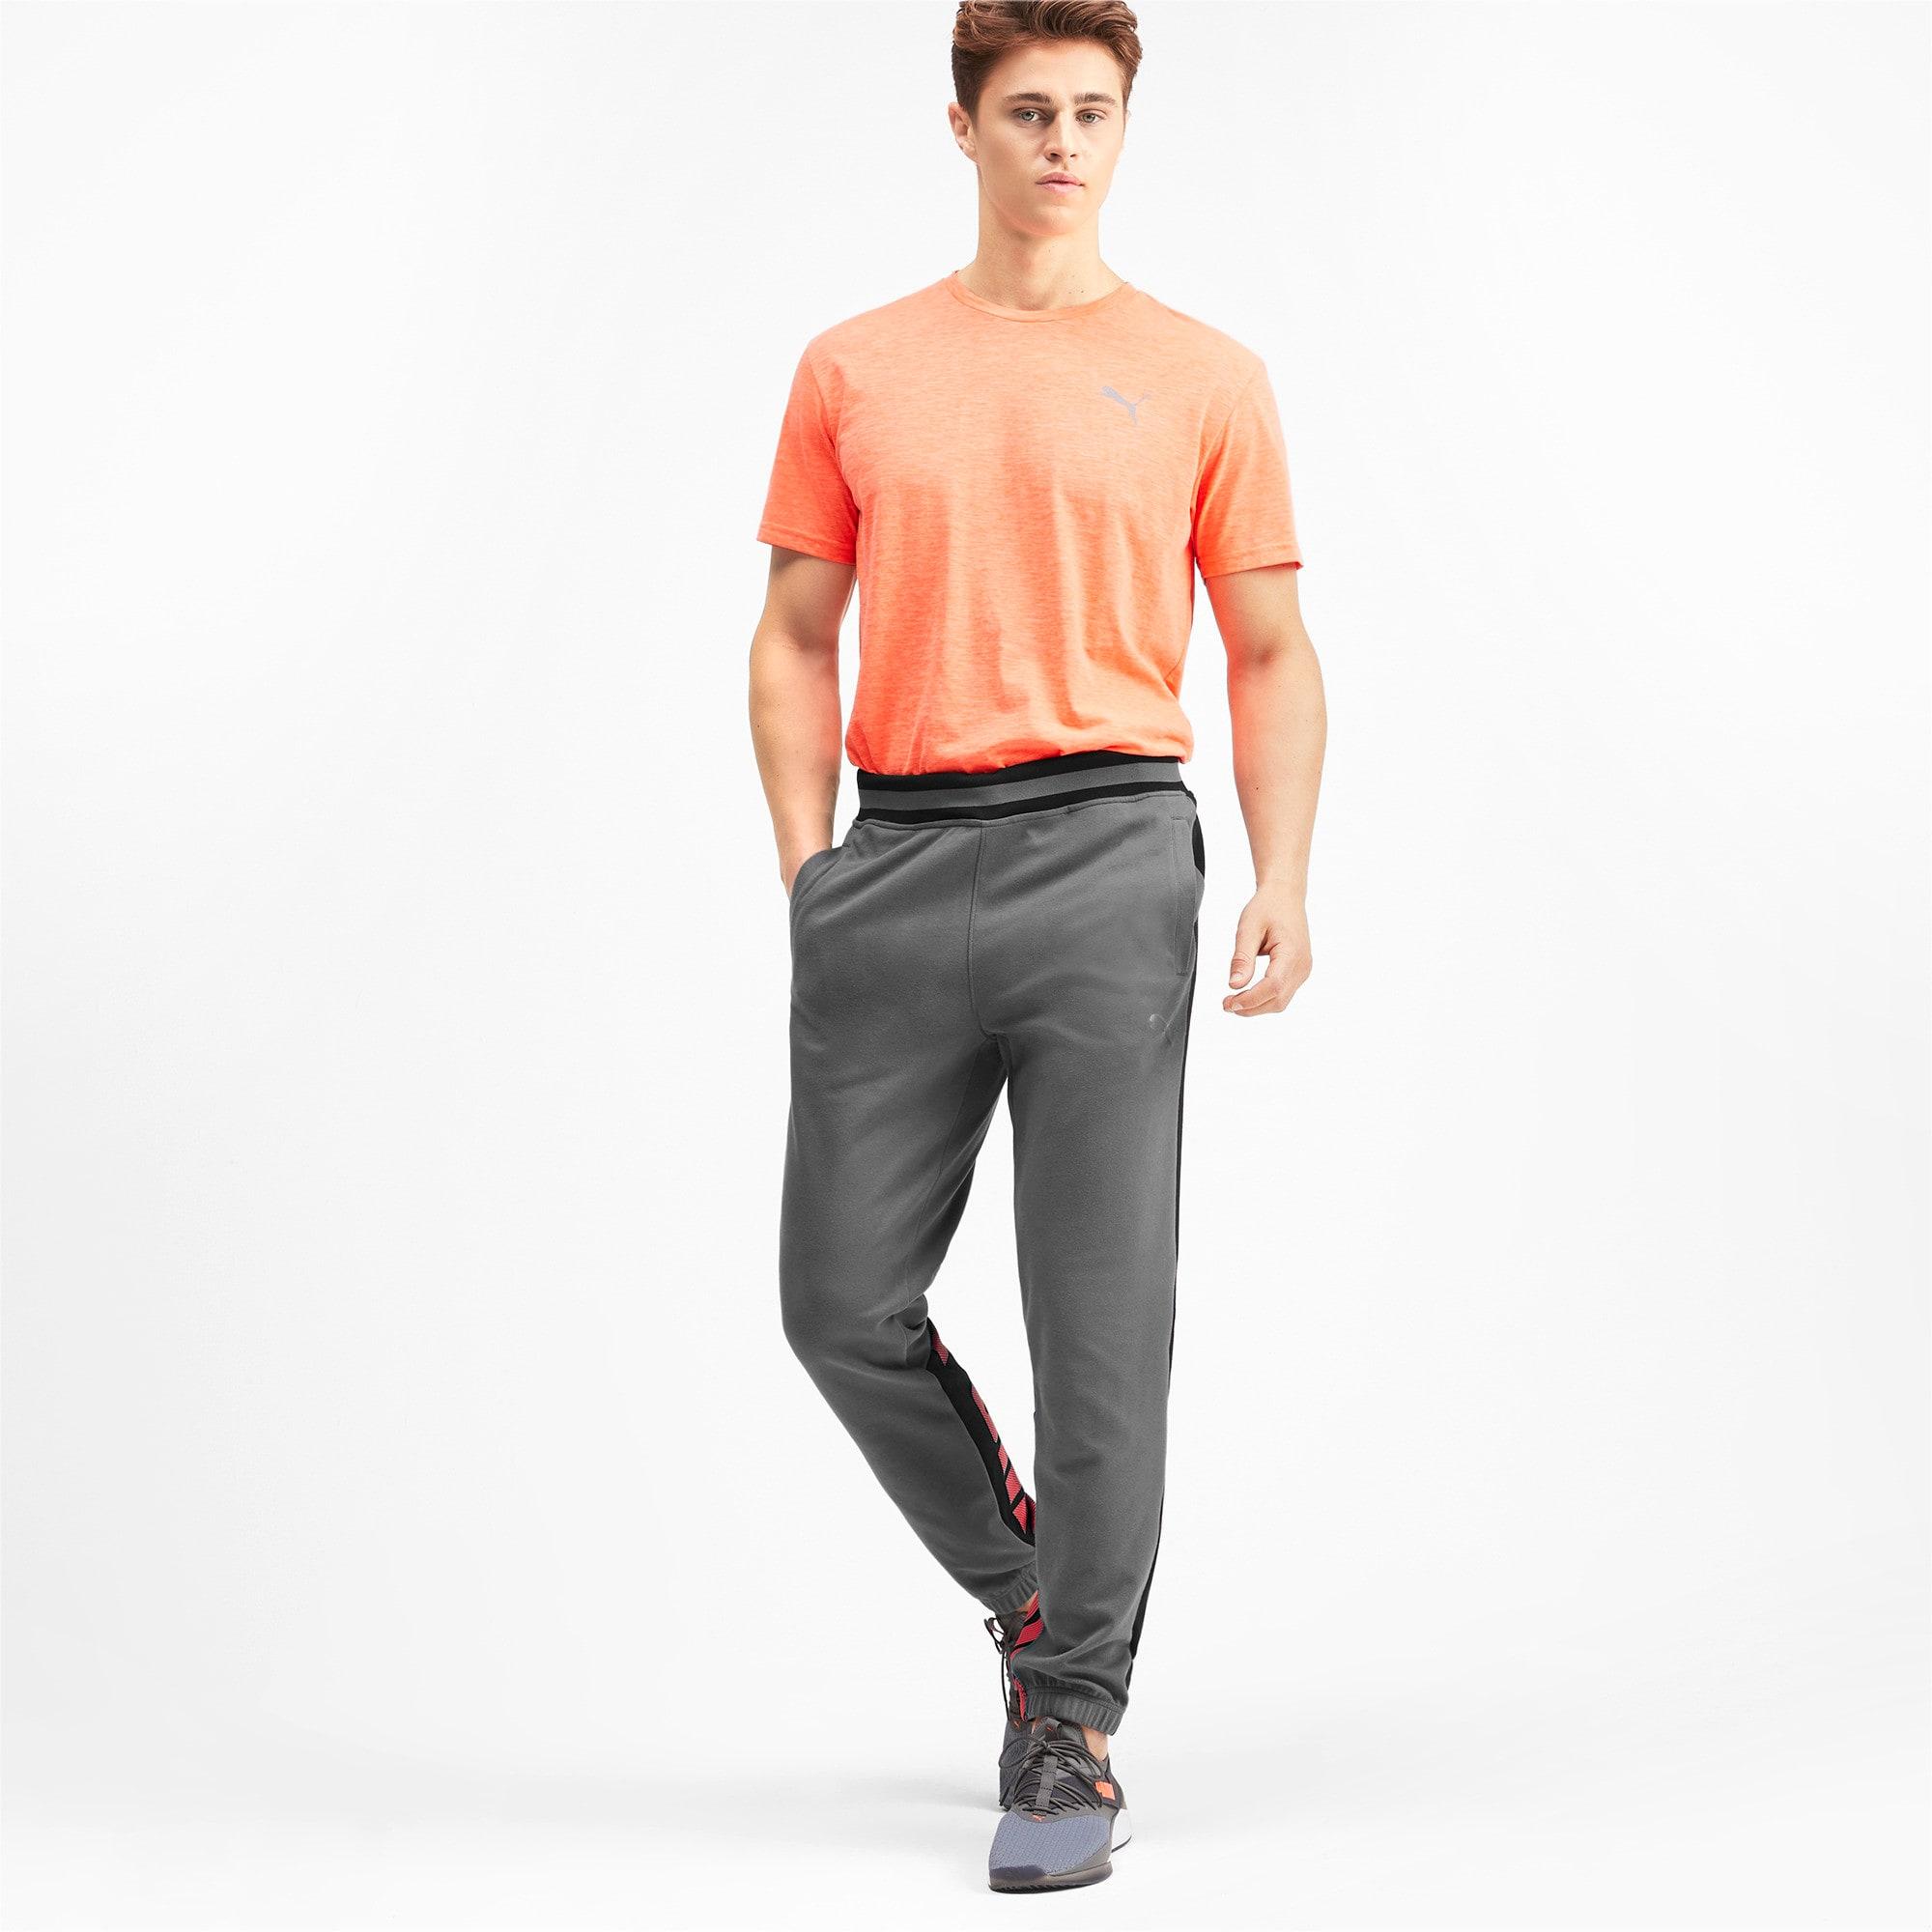 Thumbnail 4 of Collective Men's Sweatpants, CASTLEROCK, medium